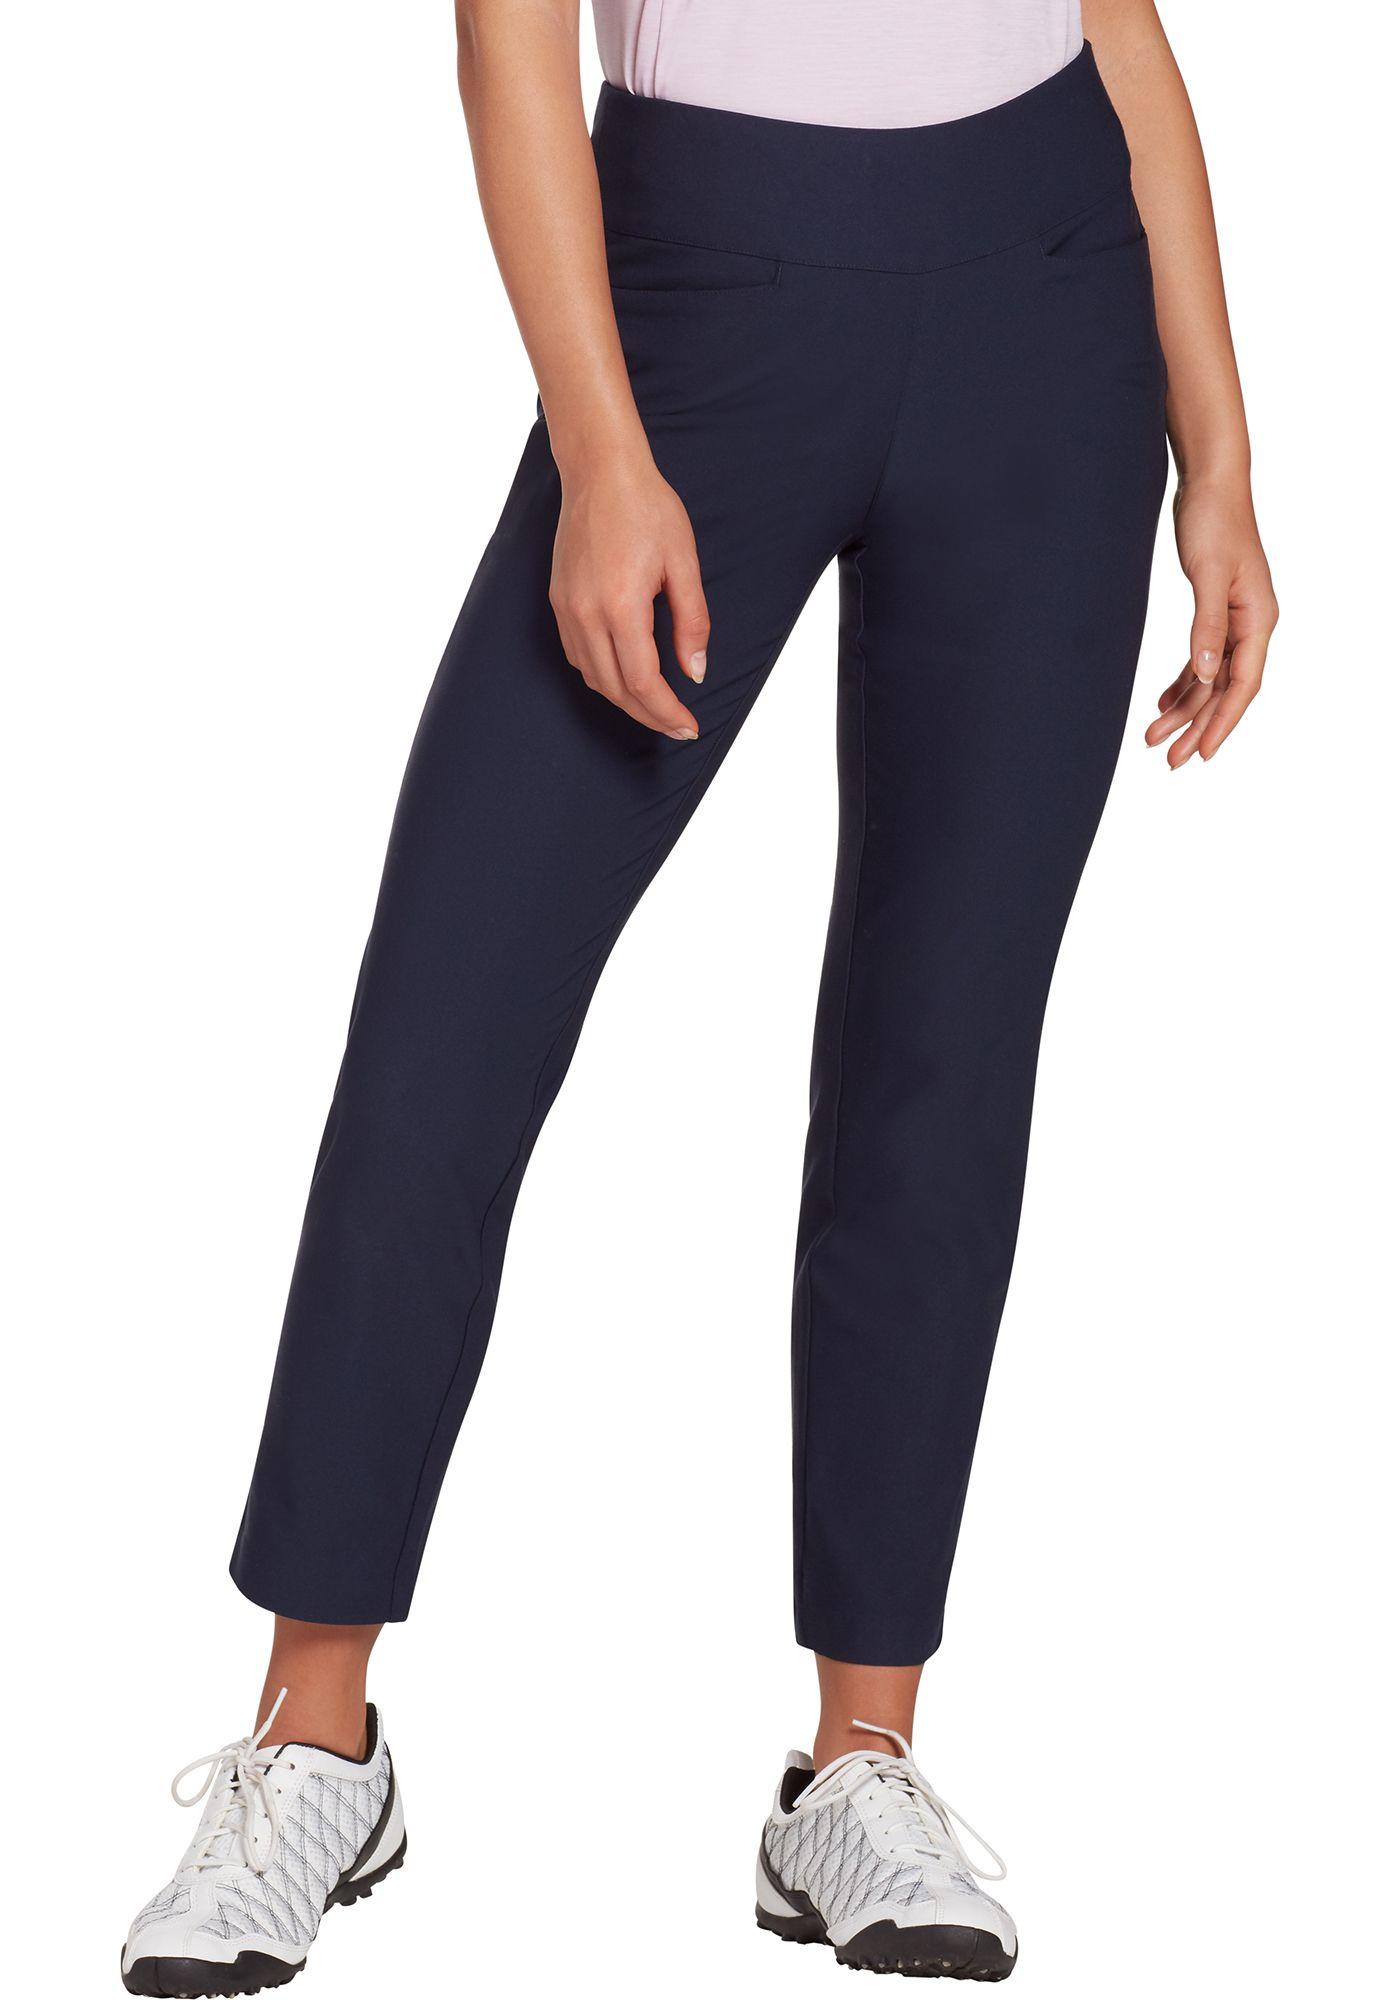 Lady Hagen Women's Tummy Control Pull-On Golf Pants